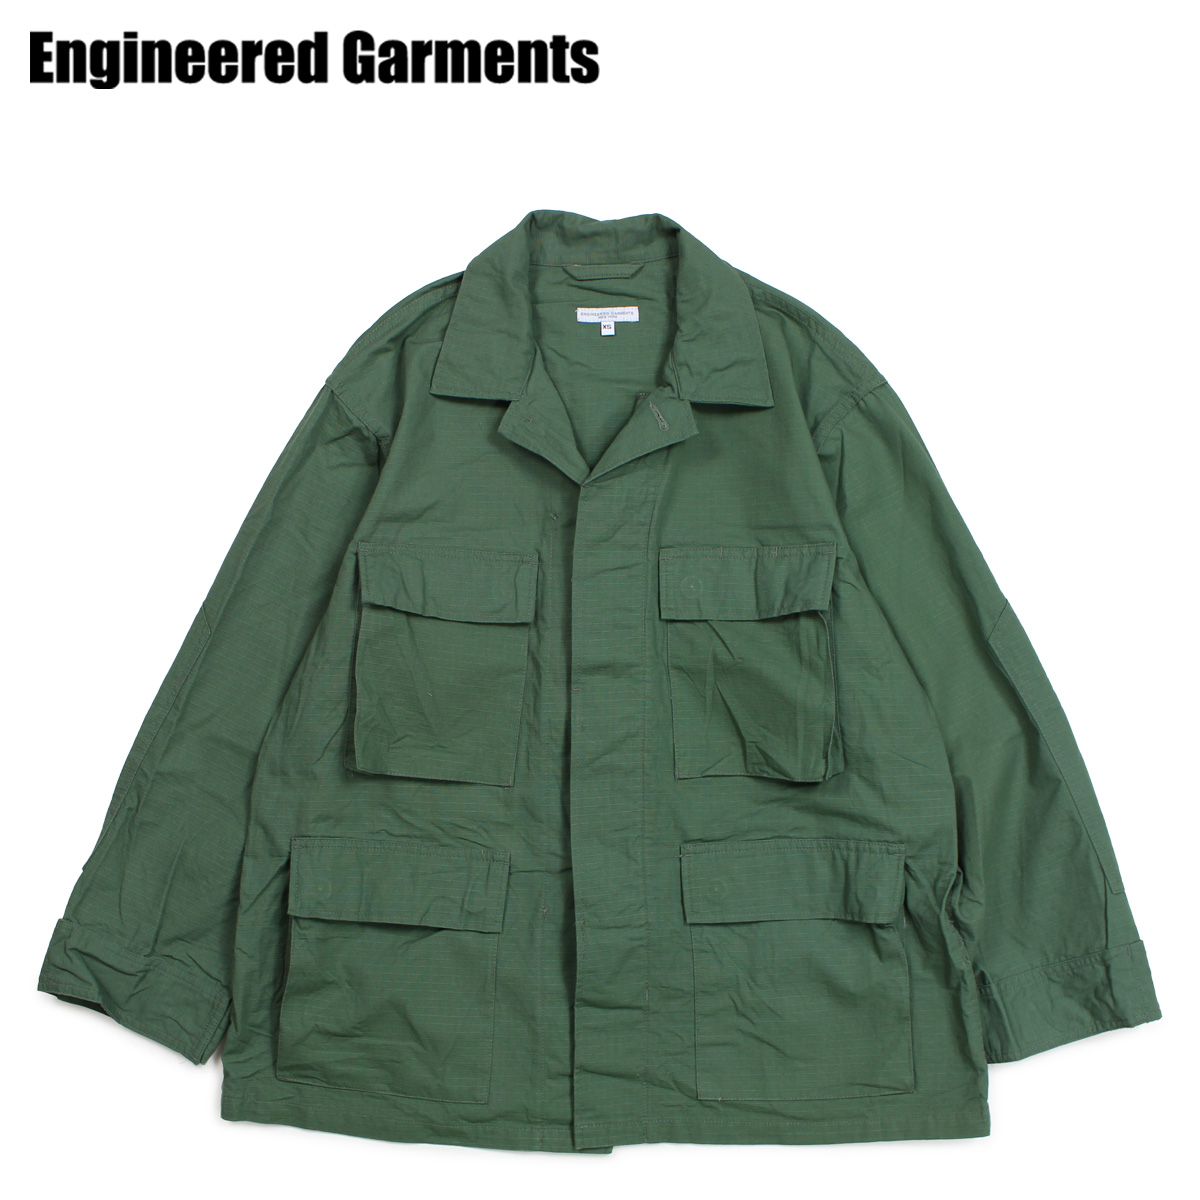 ENGINEERED GARMENTS BDU JACKET エンジニアドガーメンツ ジャケット ミリタリージャケット メンズ オリーブ 19SD002 [3/28 新入荷]